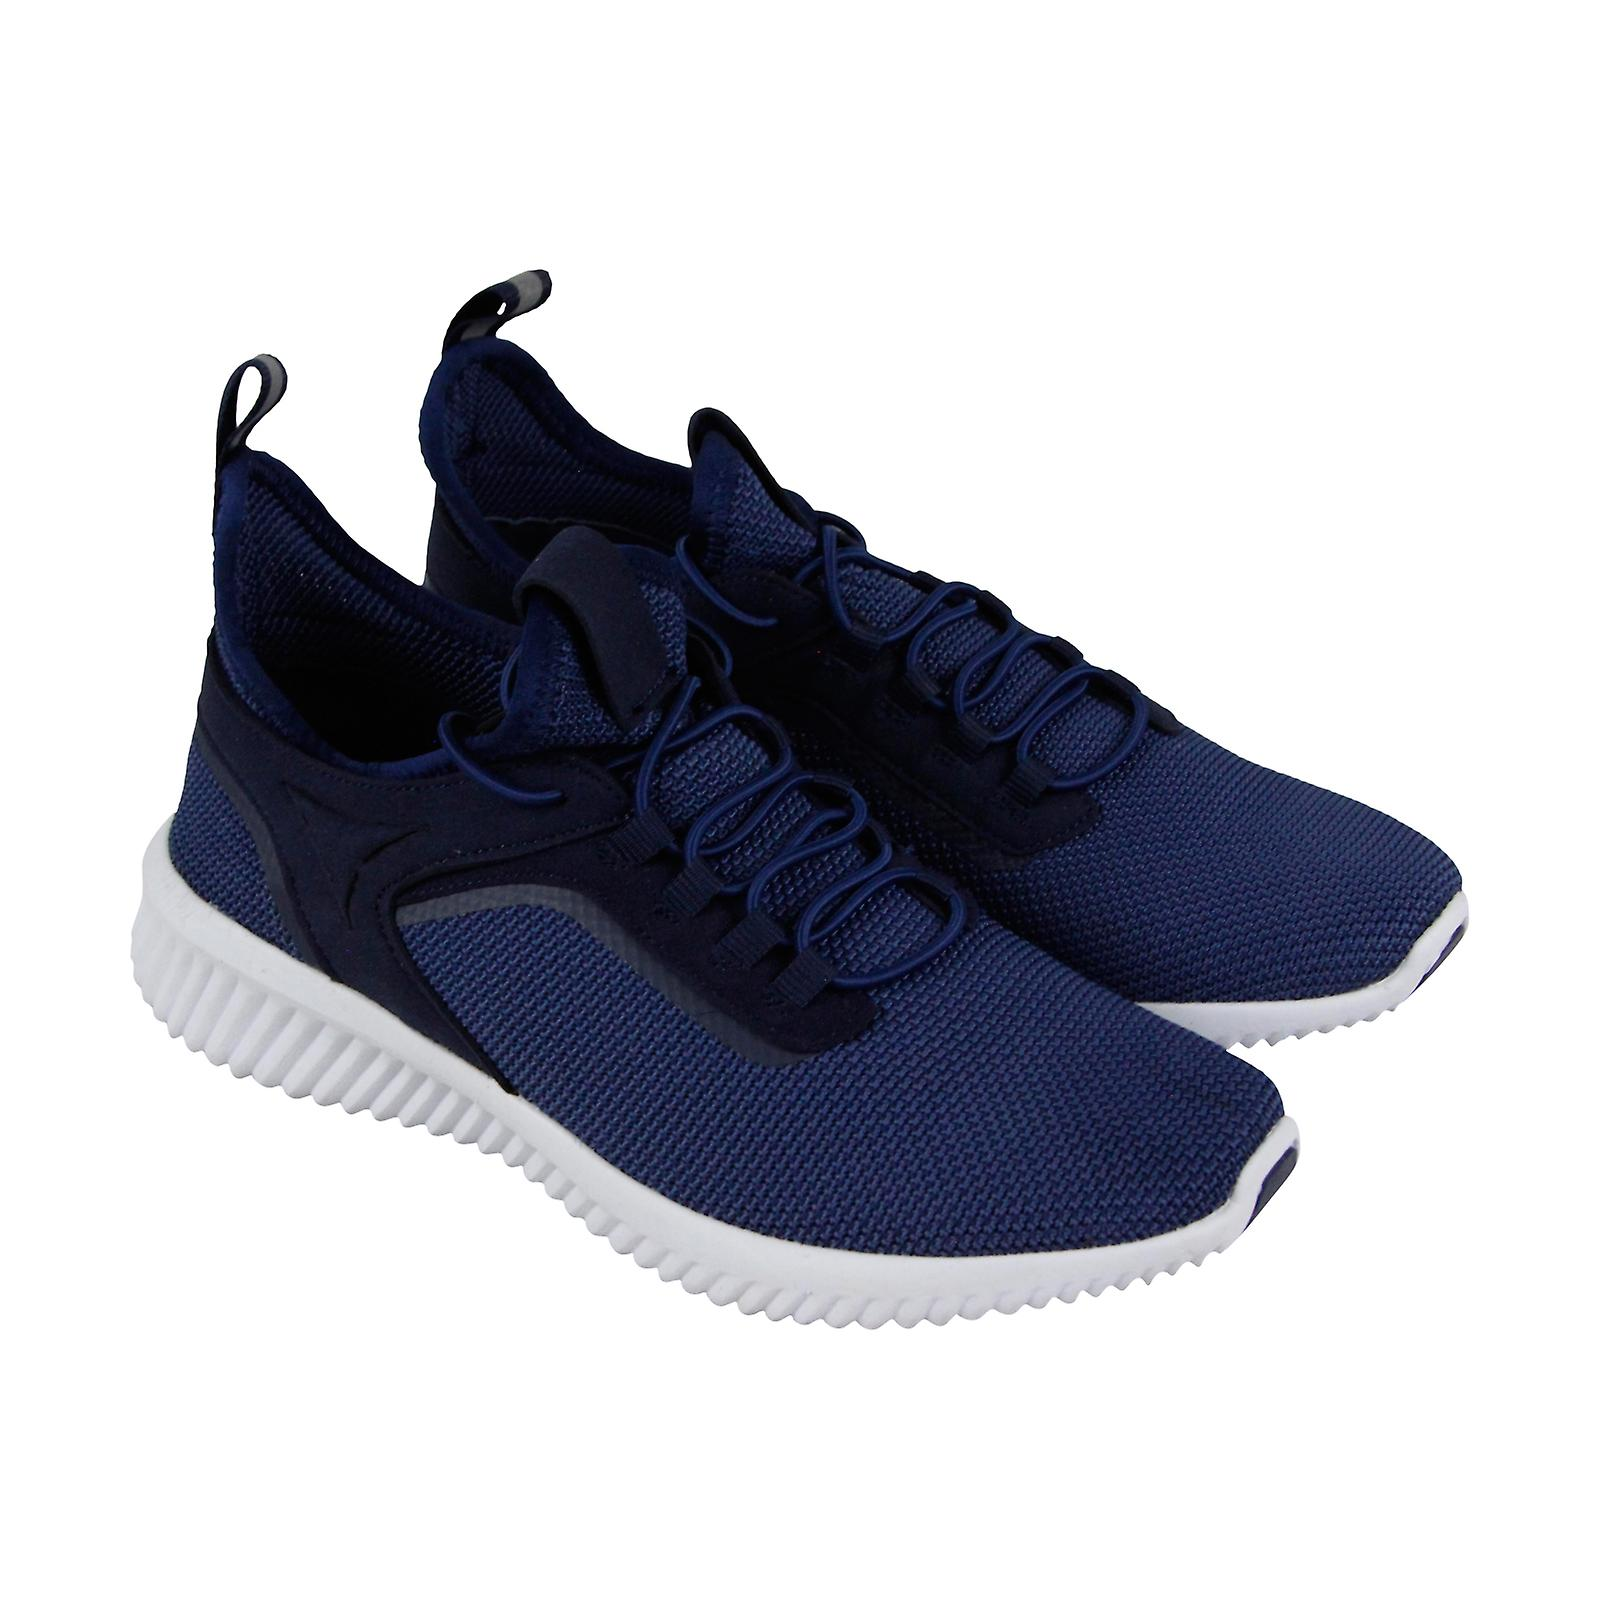 Casarse Pinchazo Bocadillo  Steve Madden mens blå canvas casual slip på mode sneakers skor ...